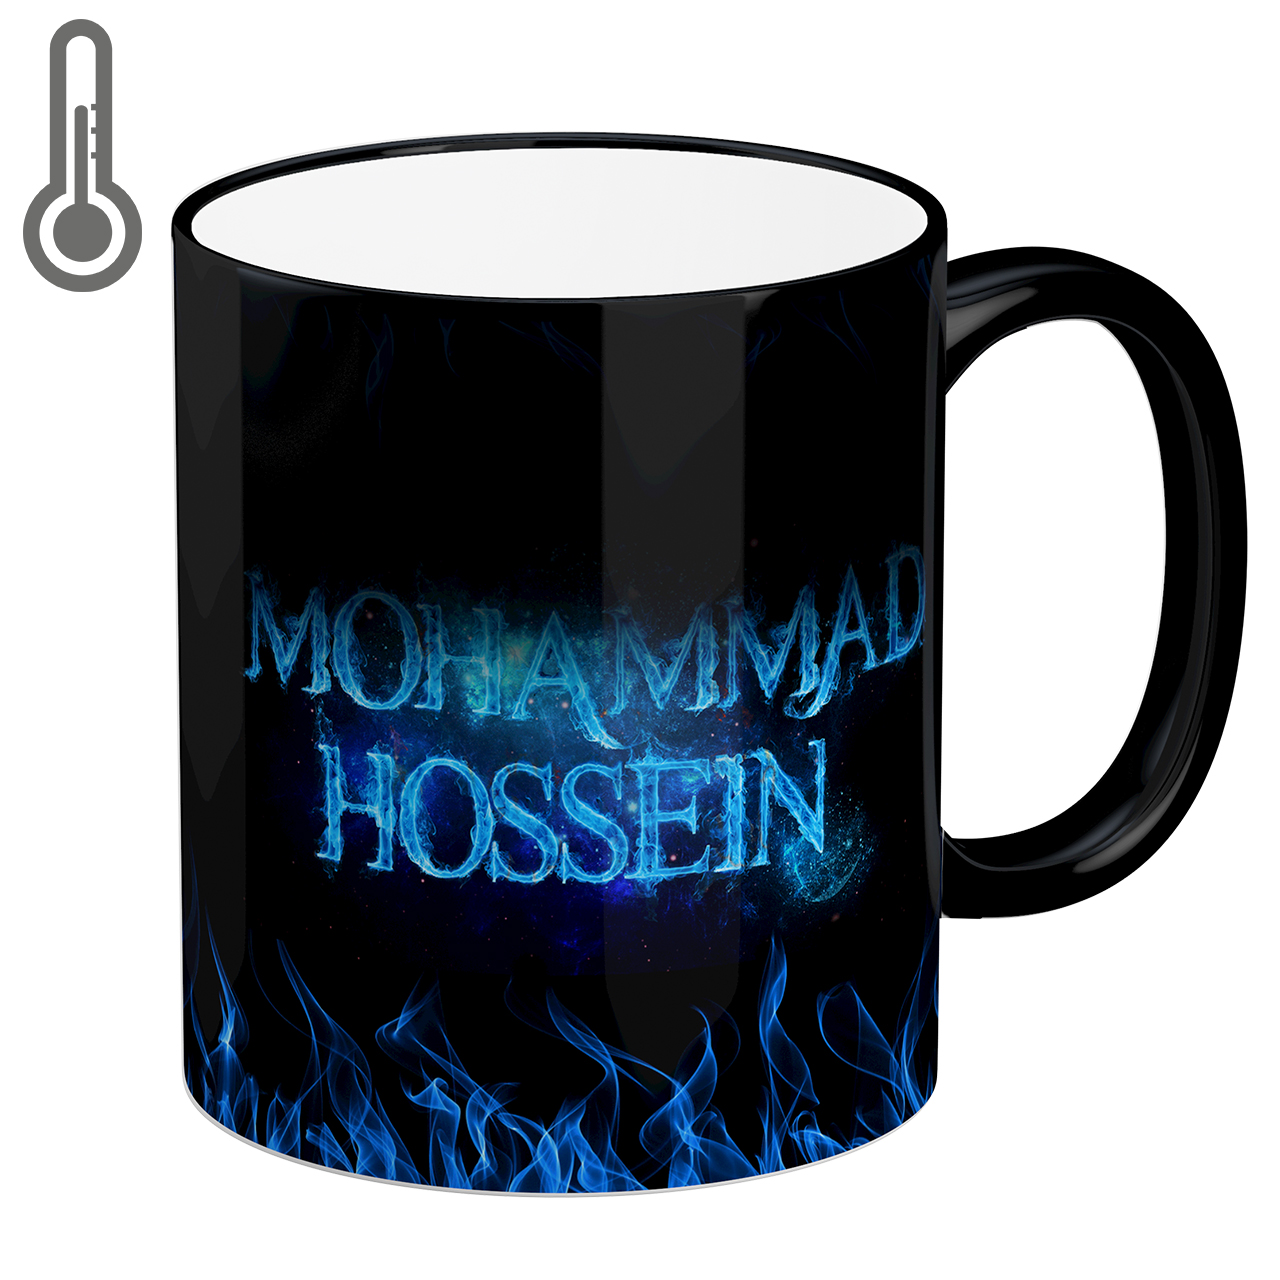 ماگ حرارتی لومانا مدل محمد حسین کد MAG1034